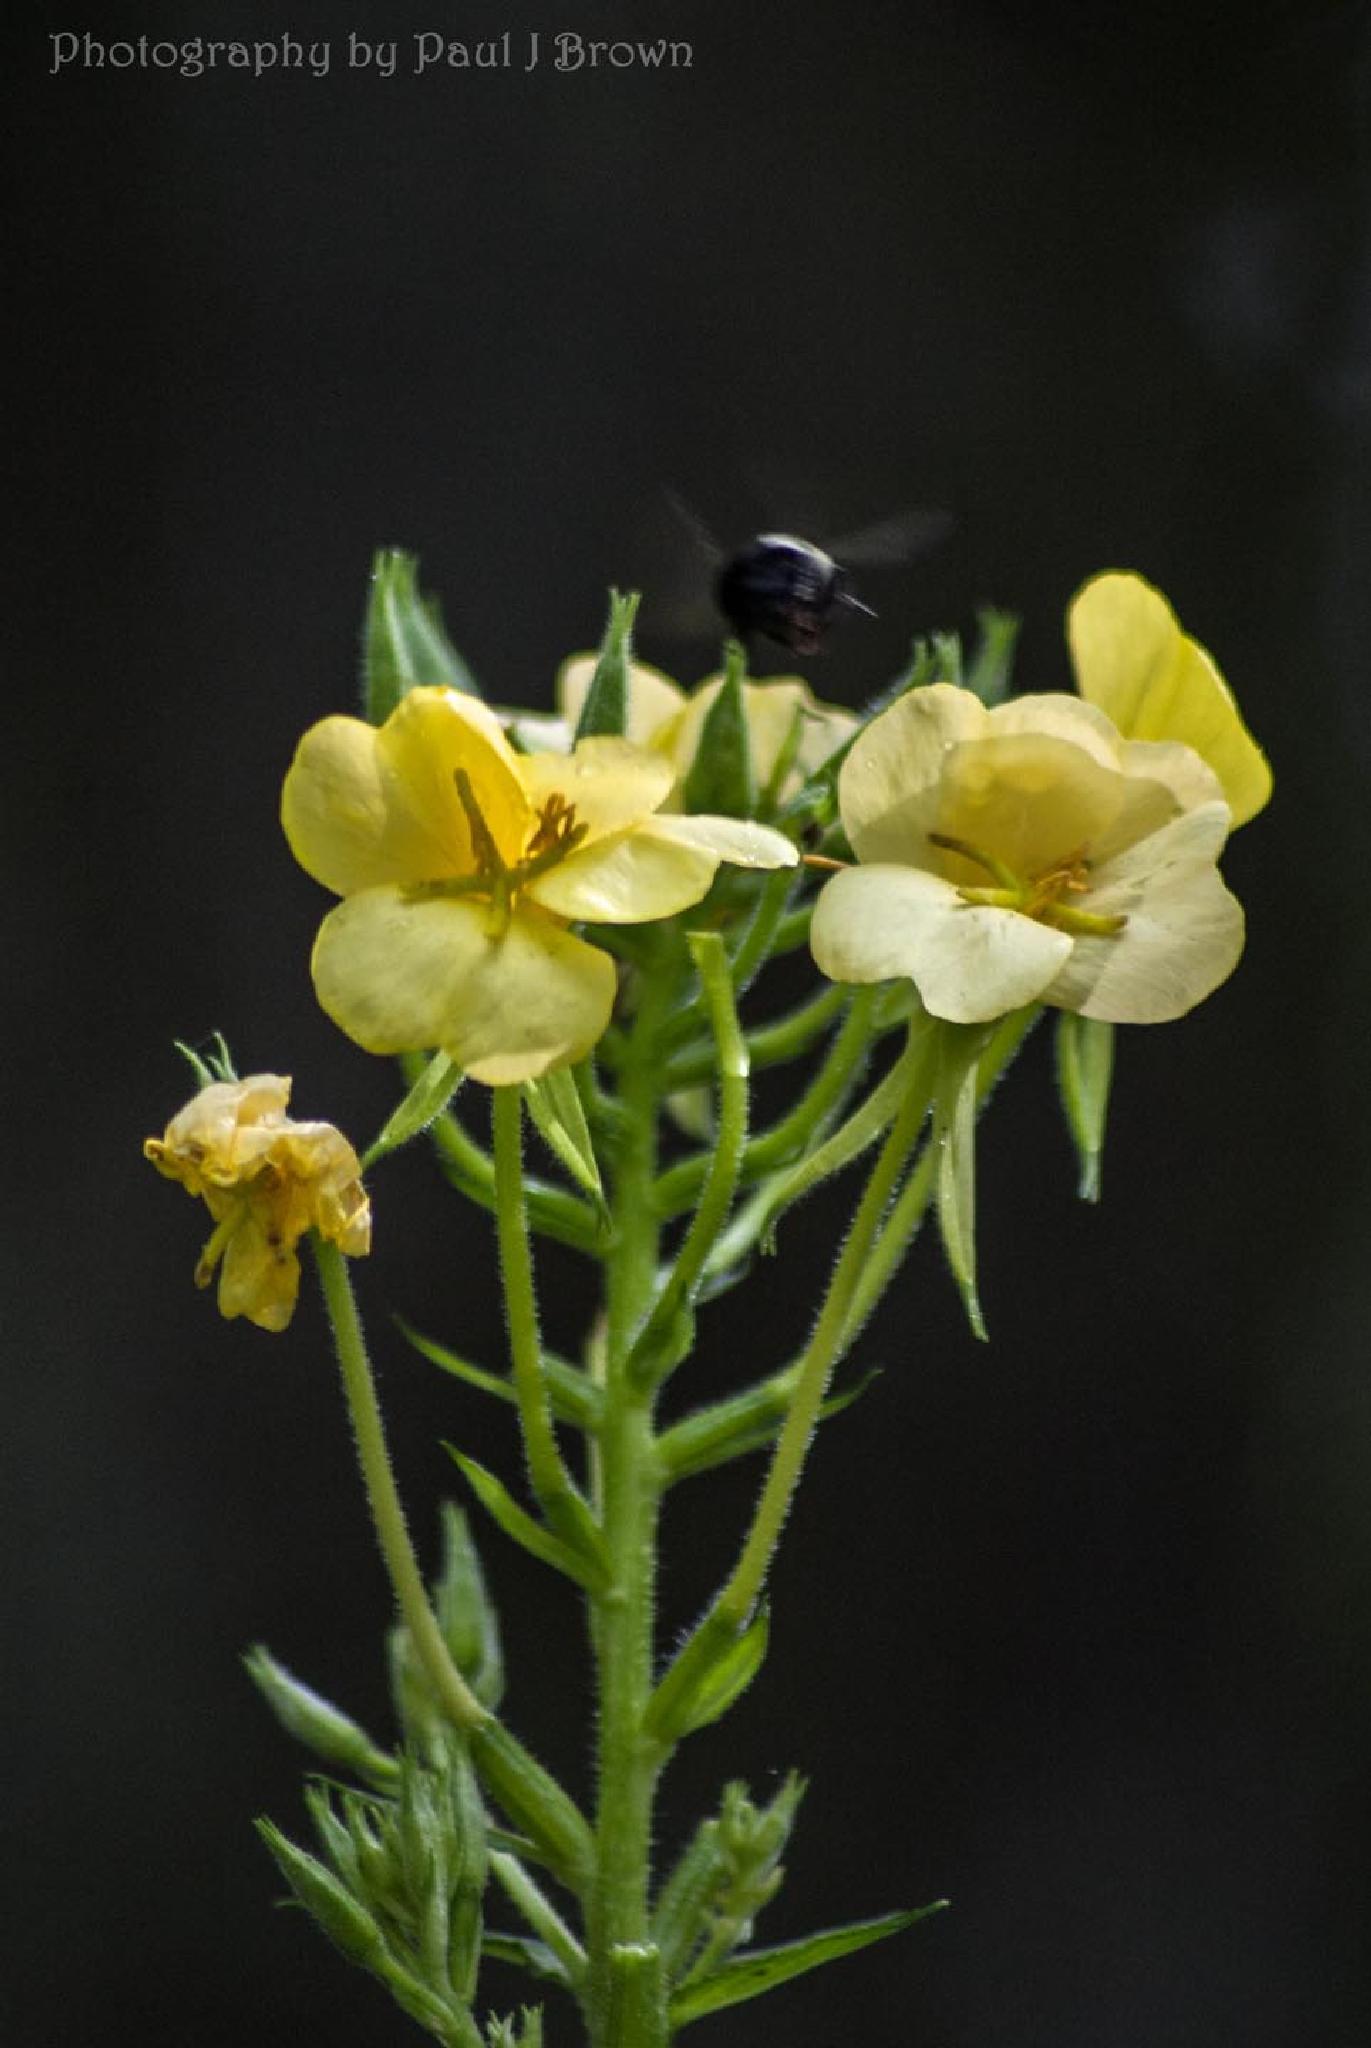 Evening Primrose - Oenothera biennis Little Chonga Rd - Macon County, NC by revpaulvet